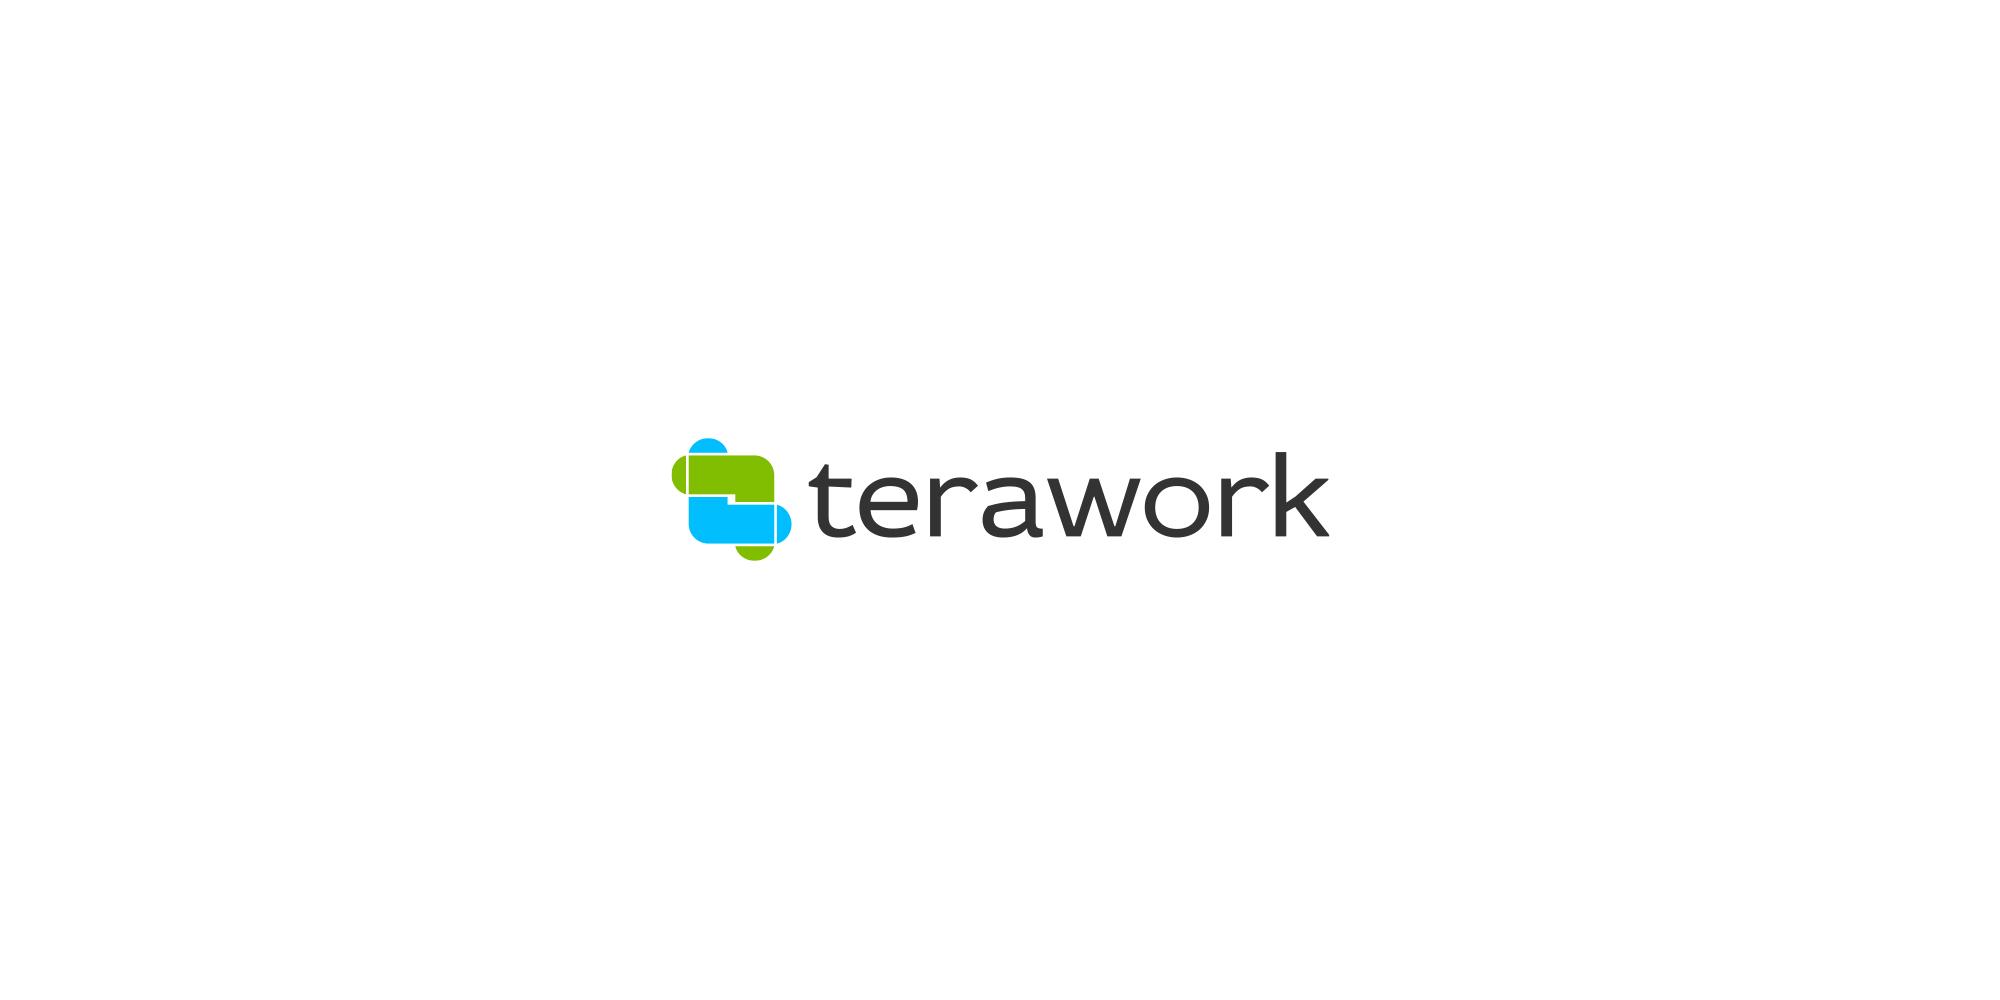 terawork Logo 2